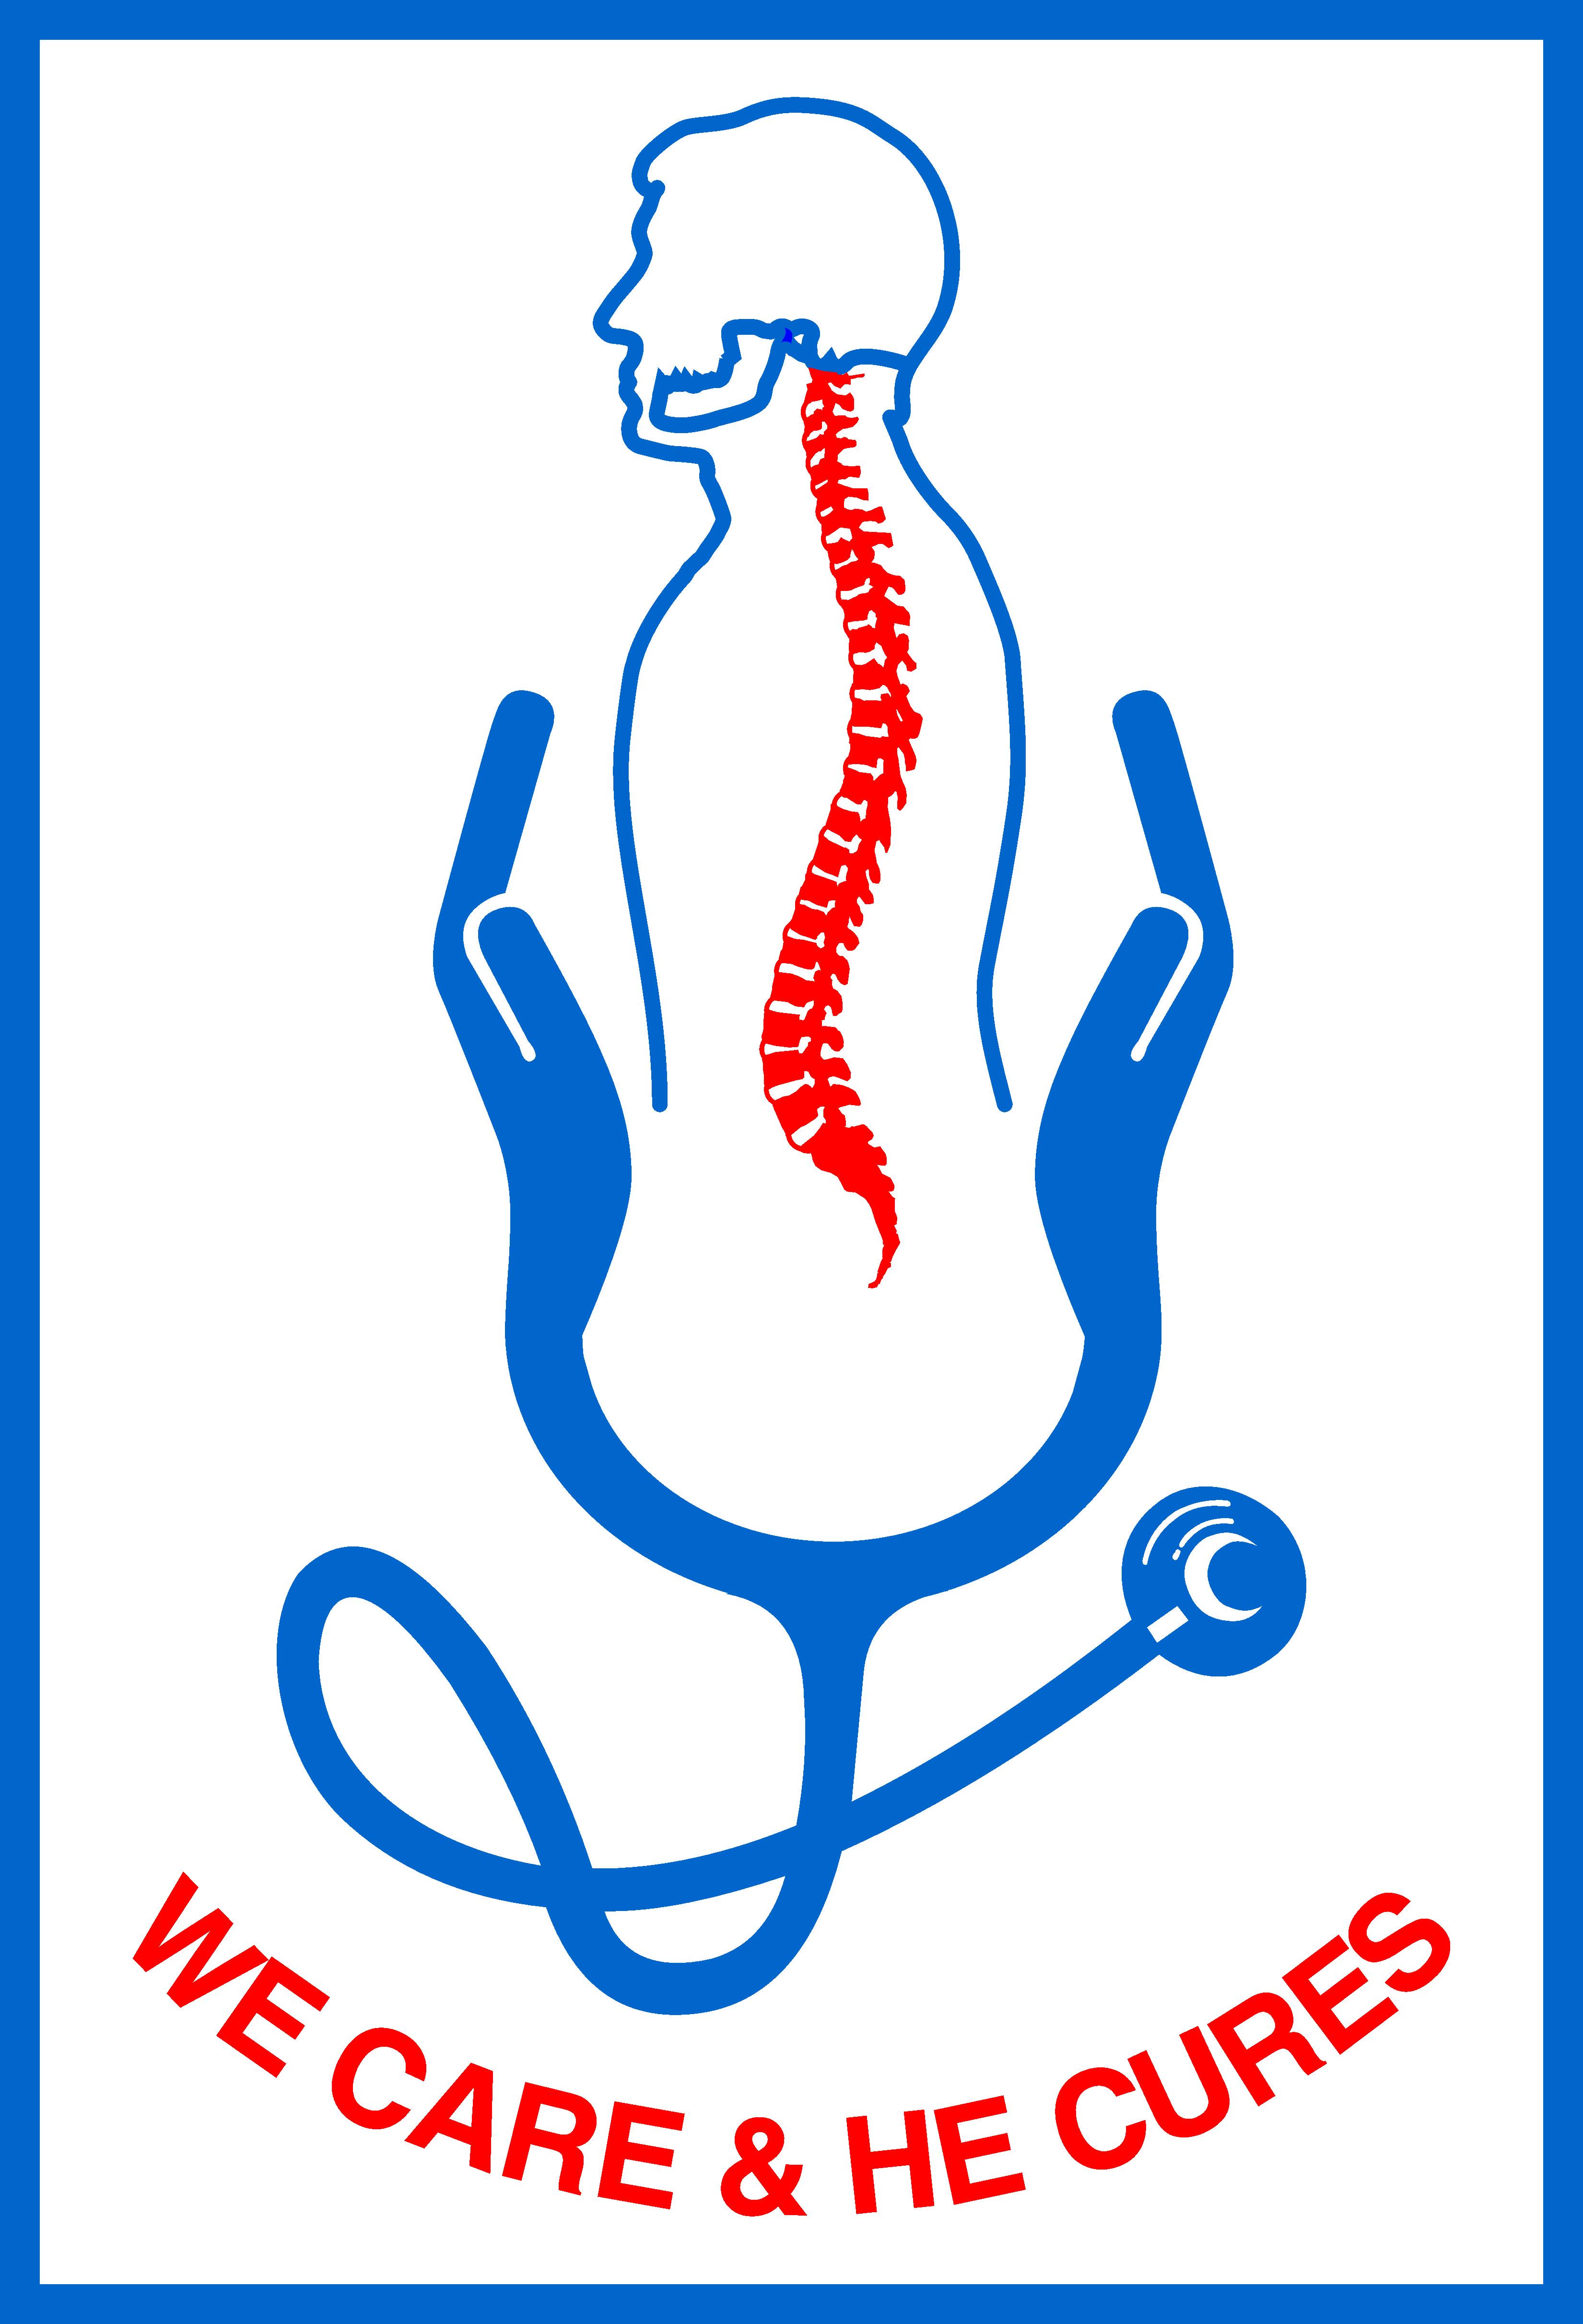 Spine Care And Ortho Care Hospital